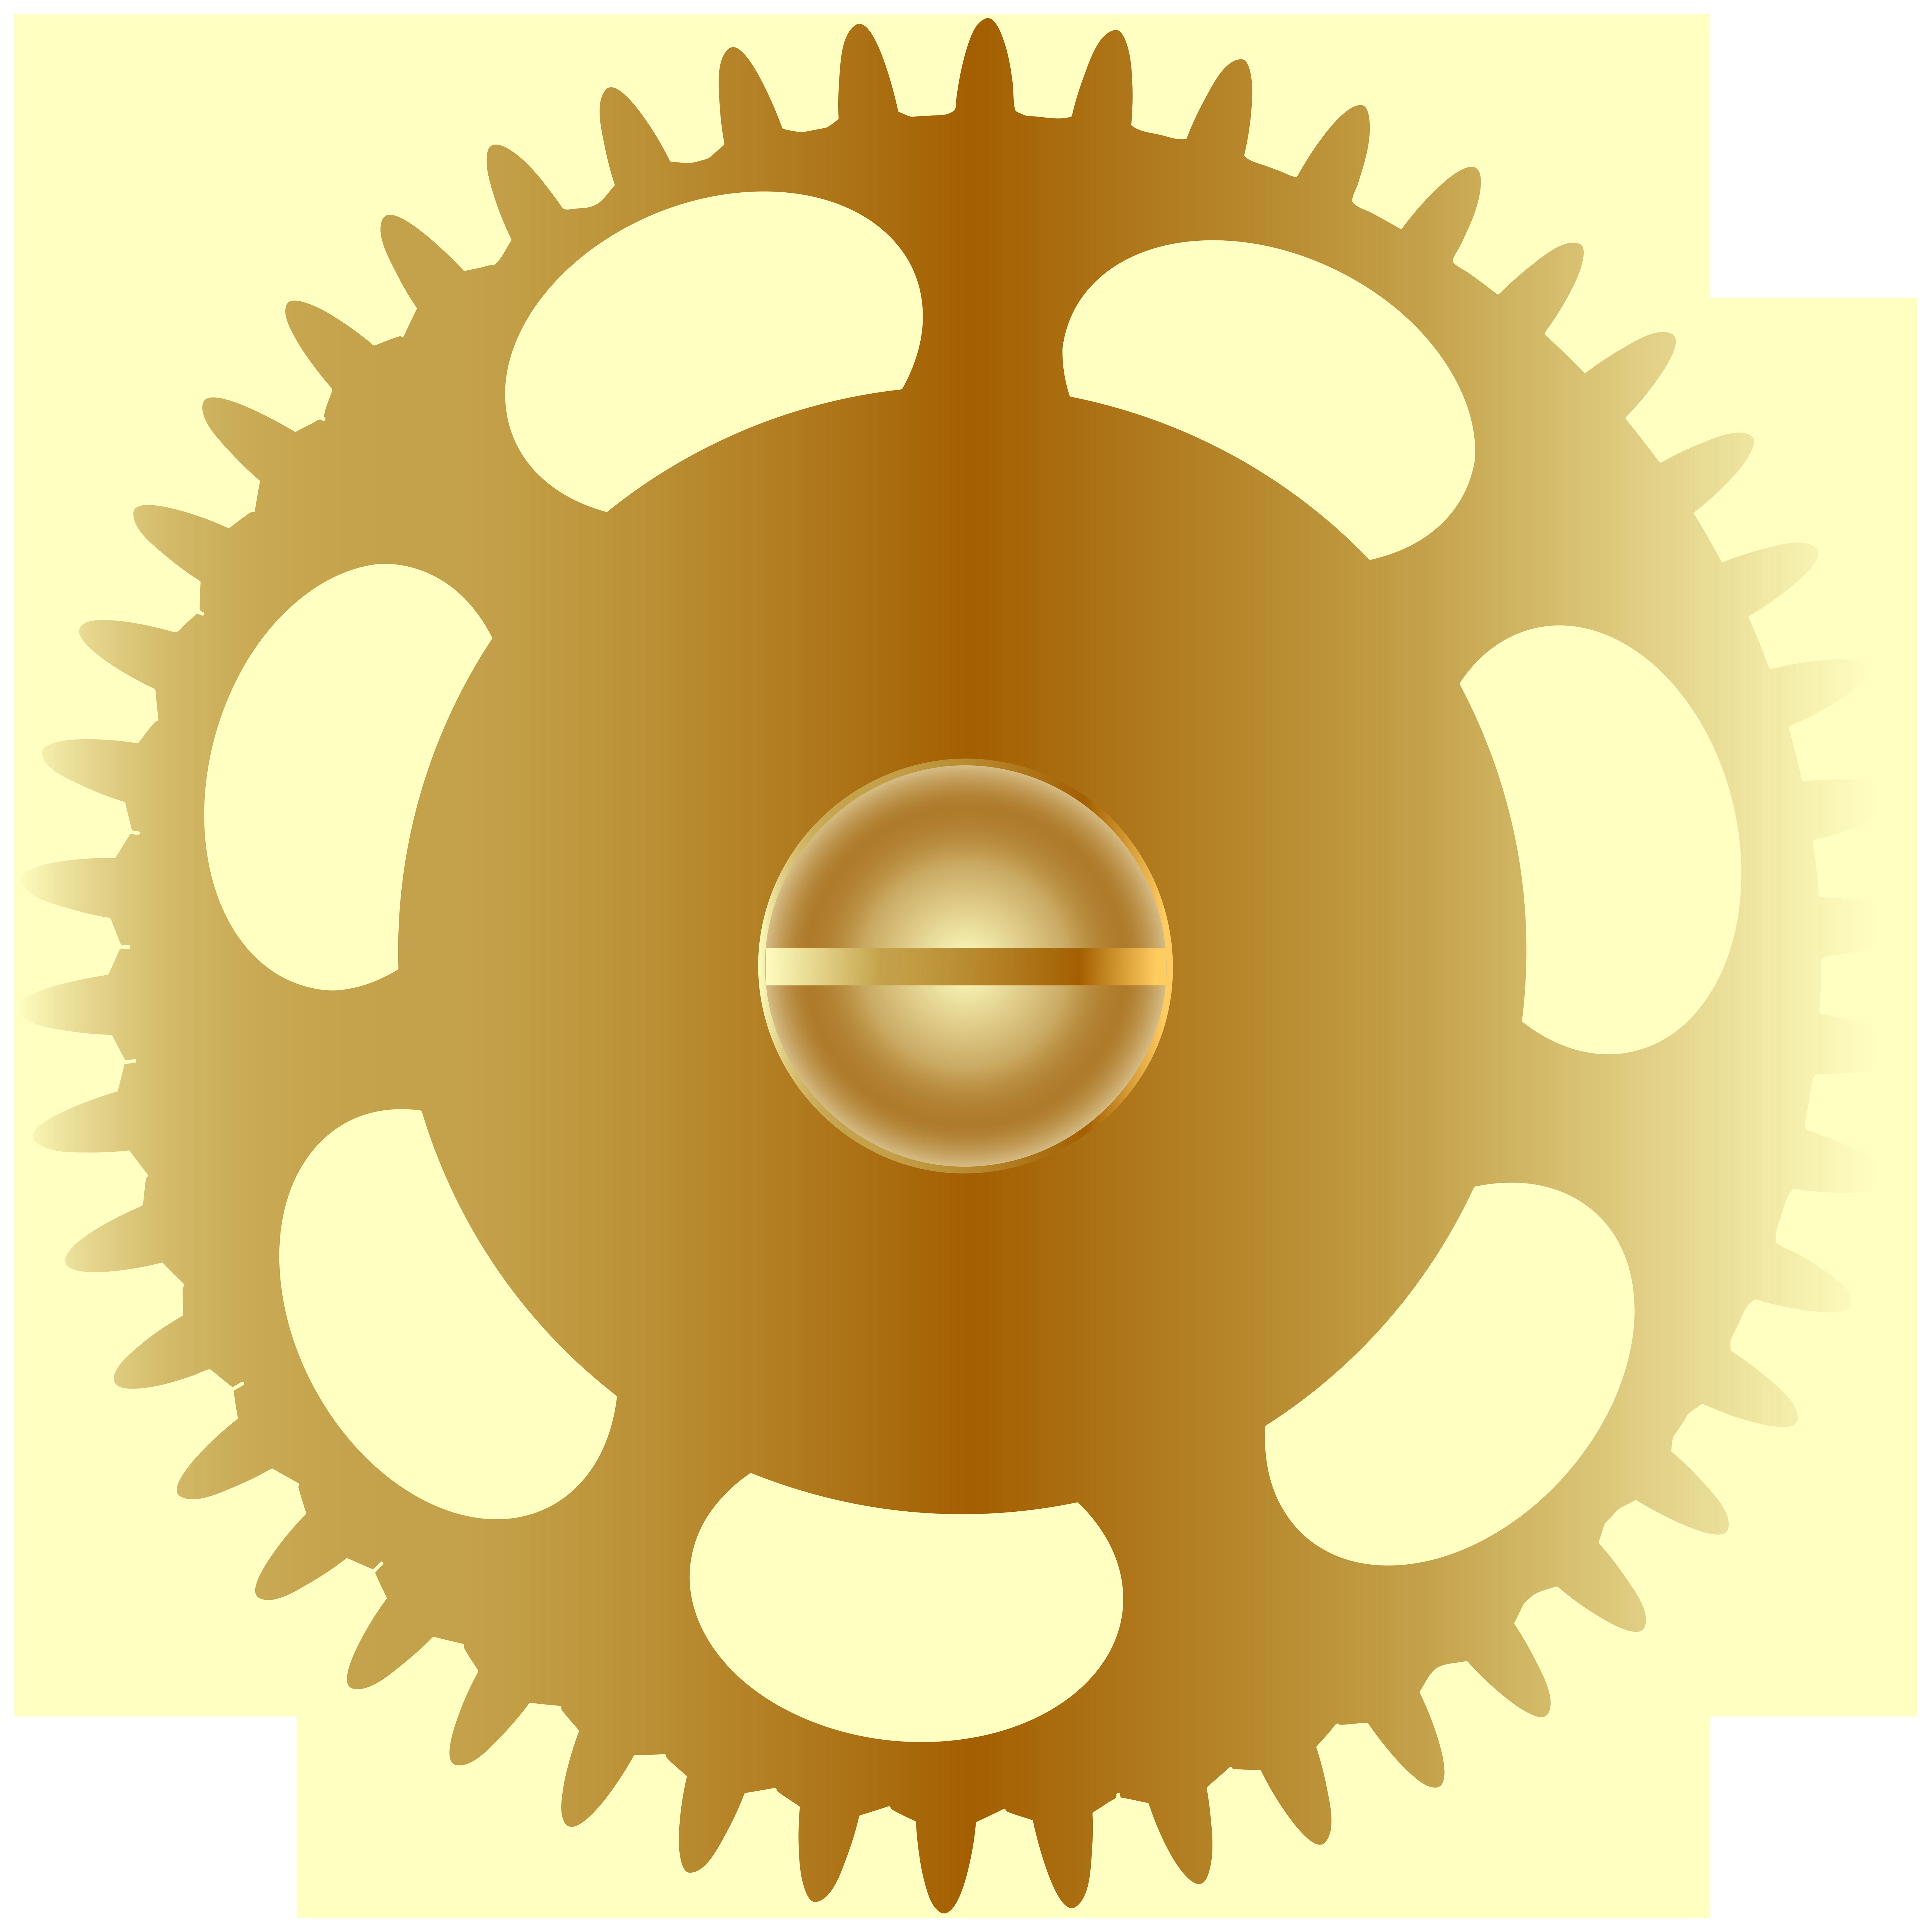 Gears clipart green. Gold steampunk gear png